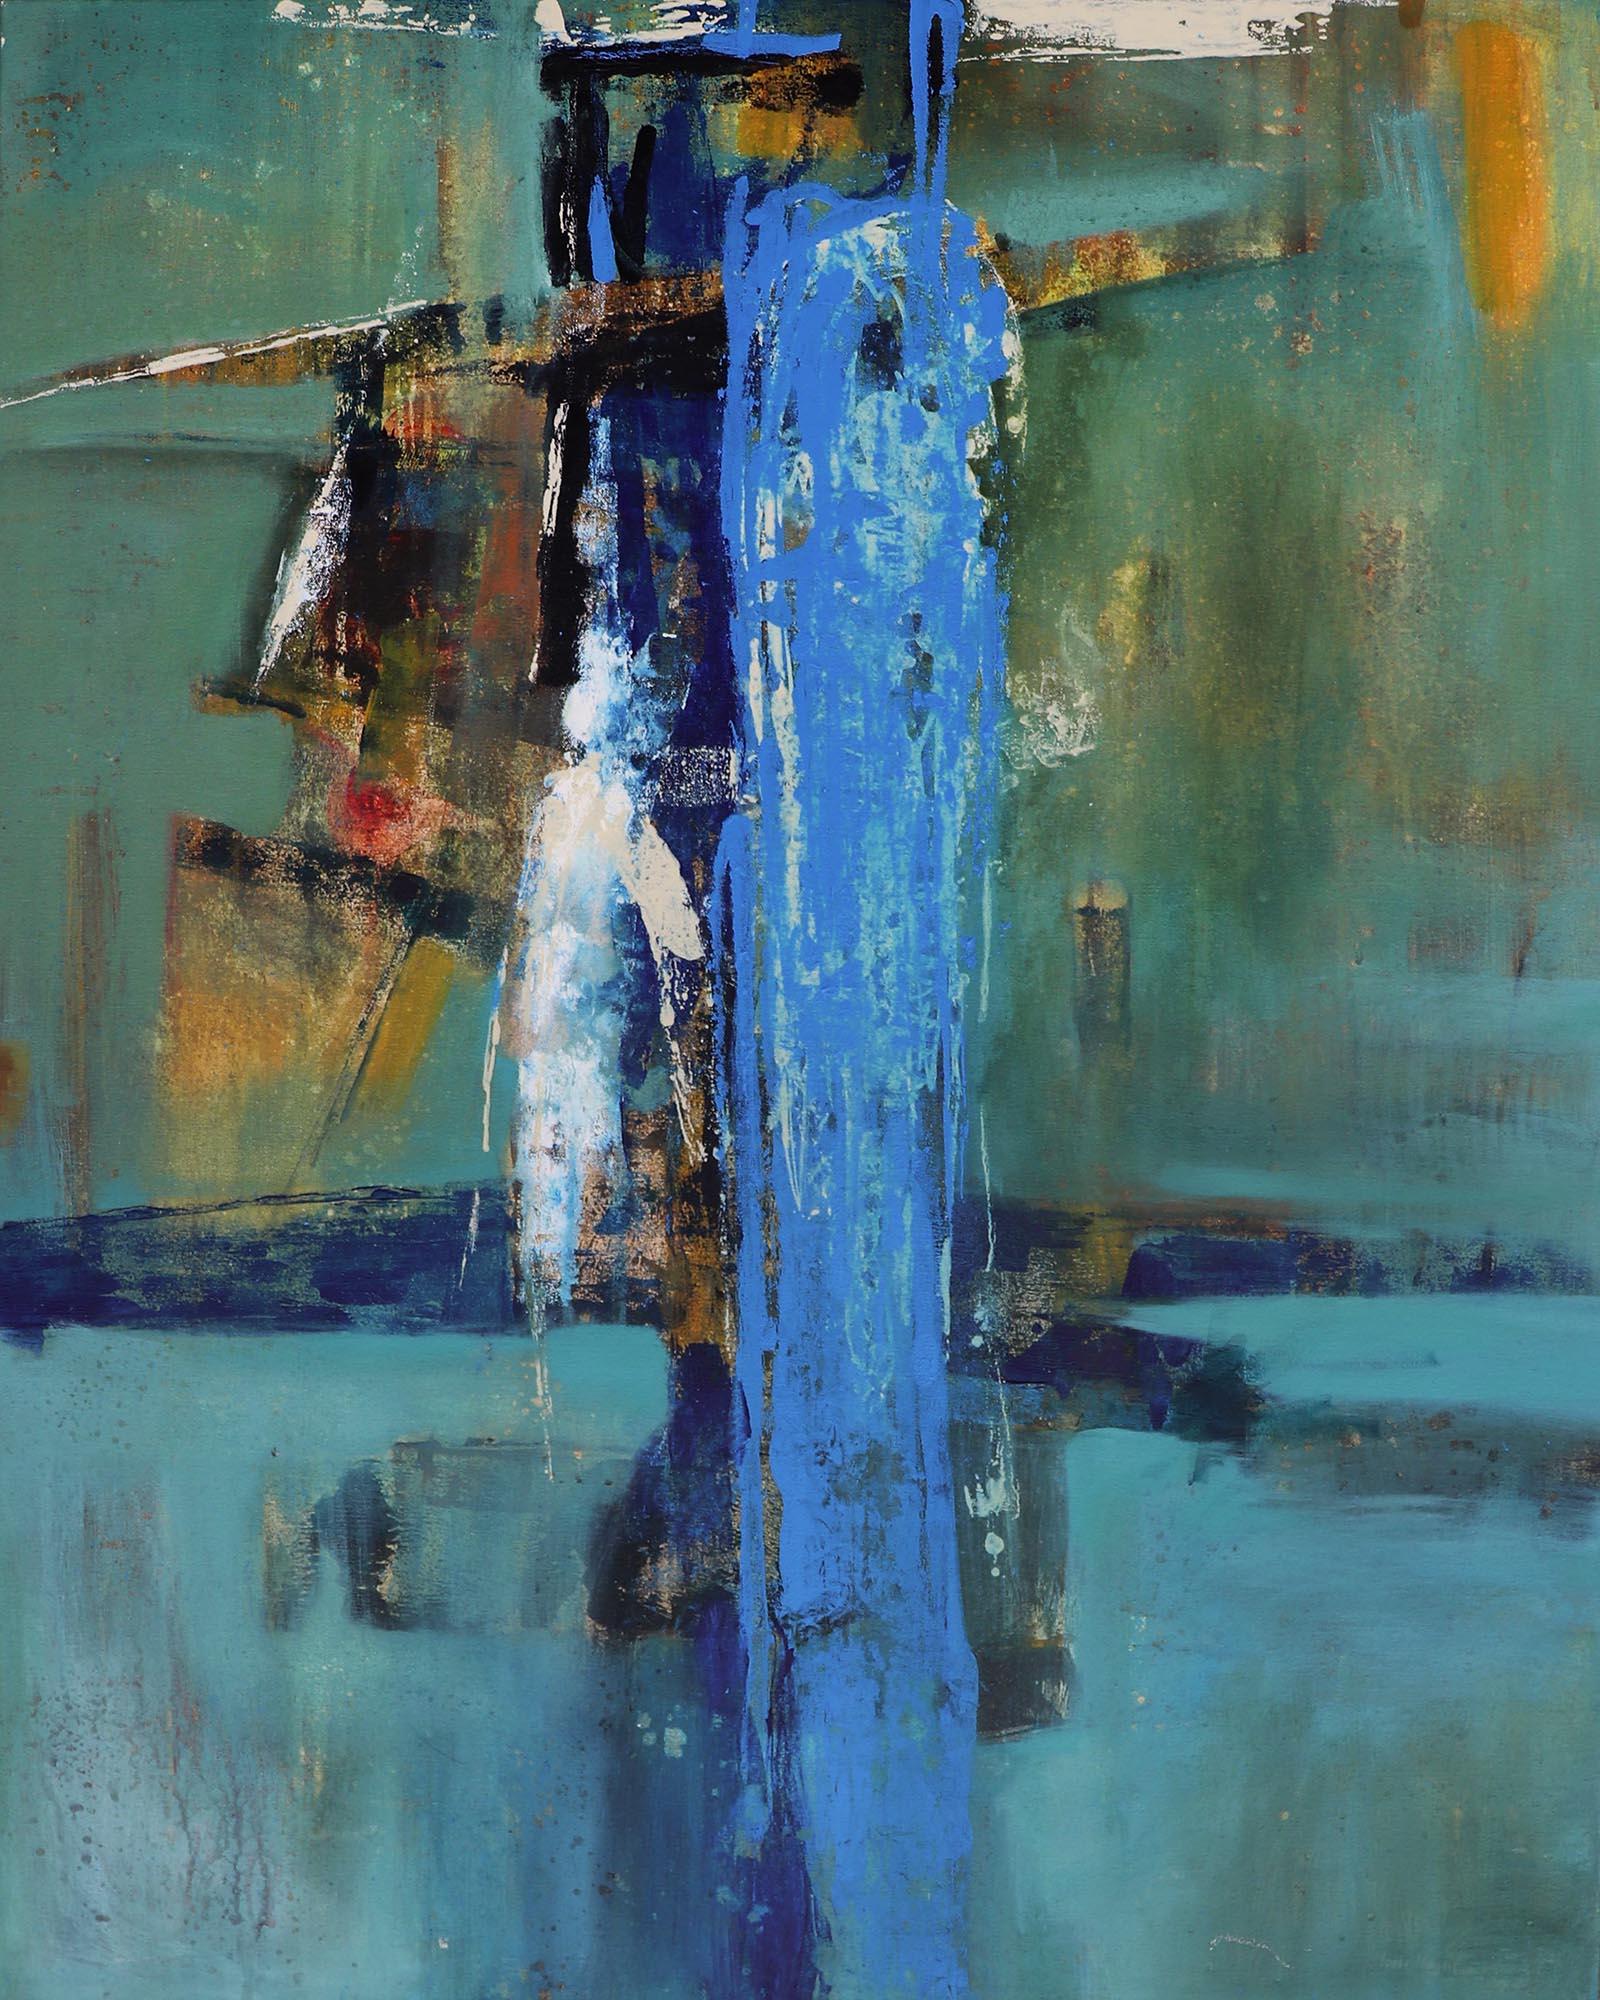 Moinuddin Moni, Monolith 2, Acrylic on canvas,100 x 80 cm, 2017